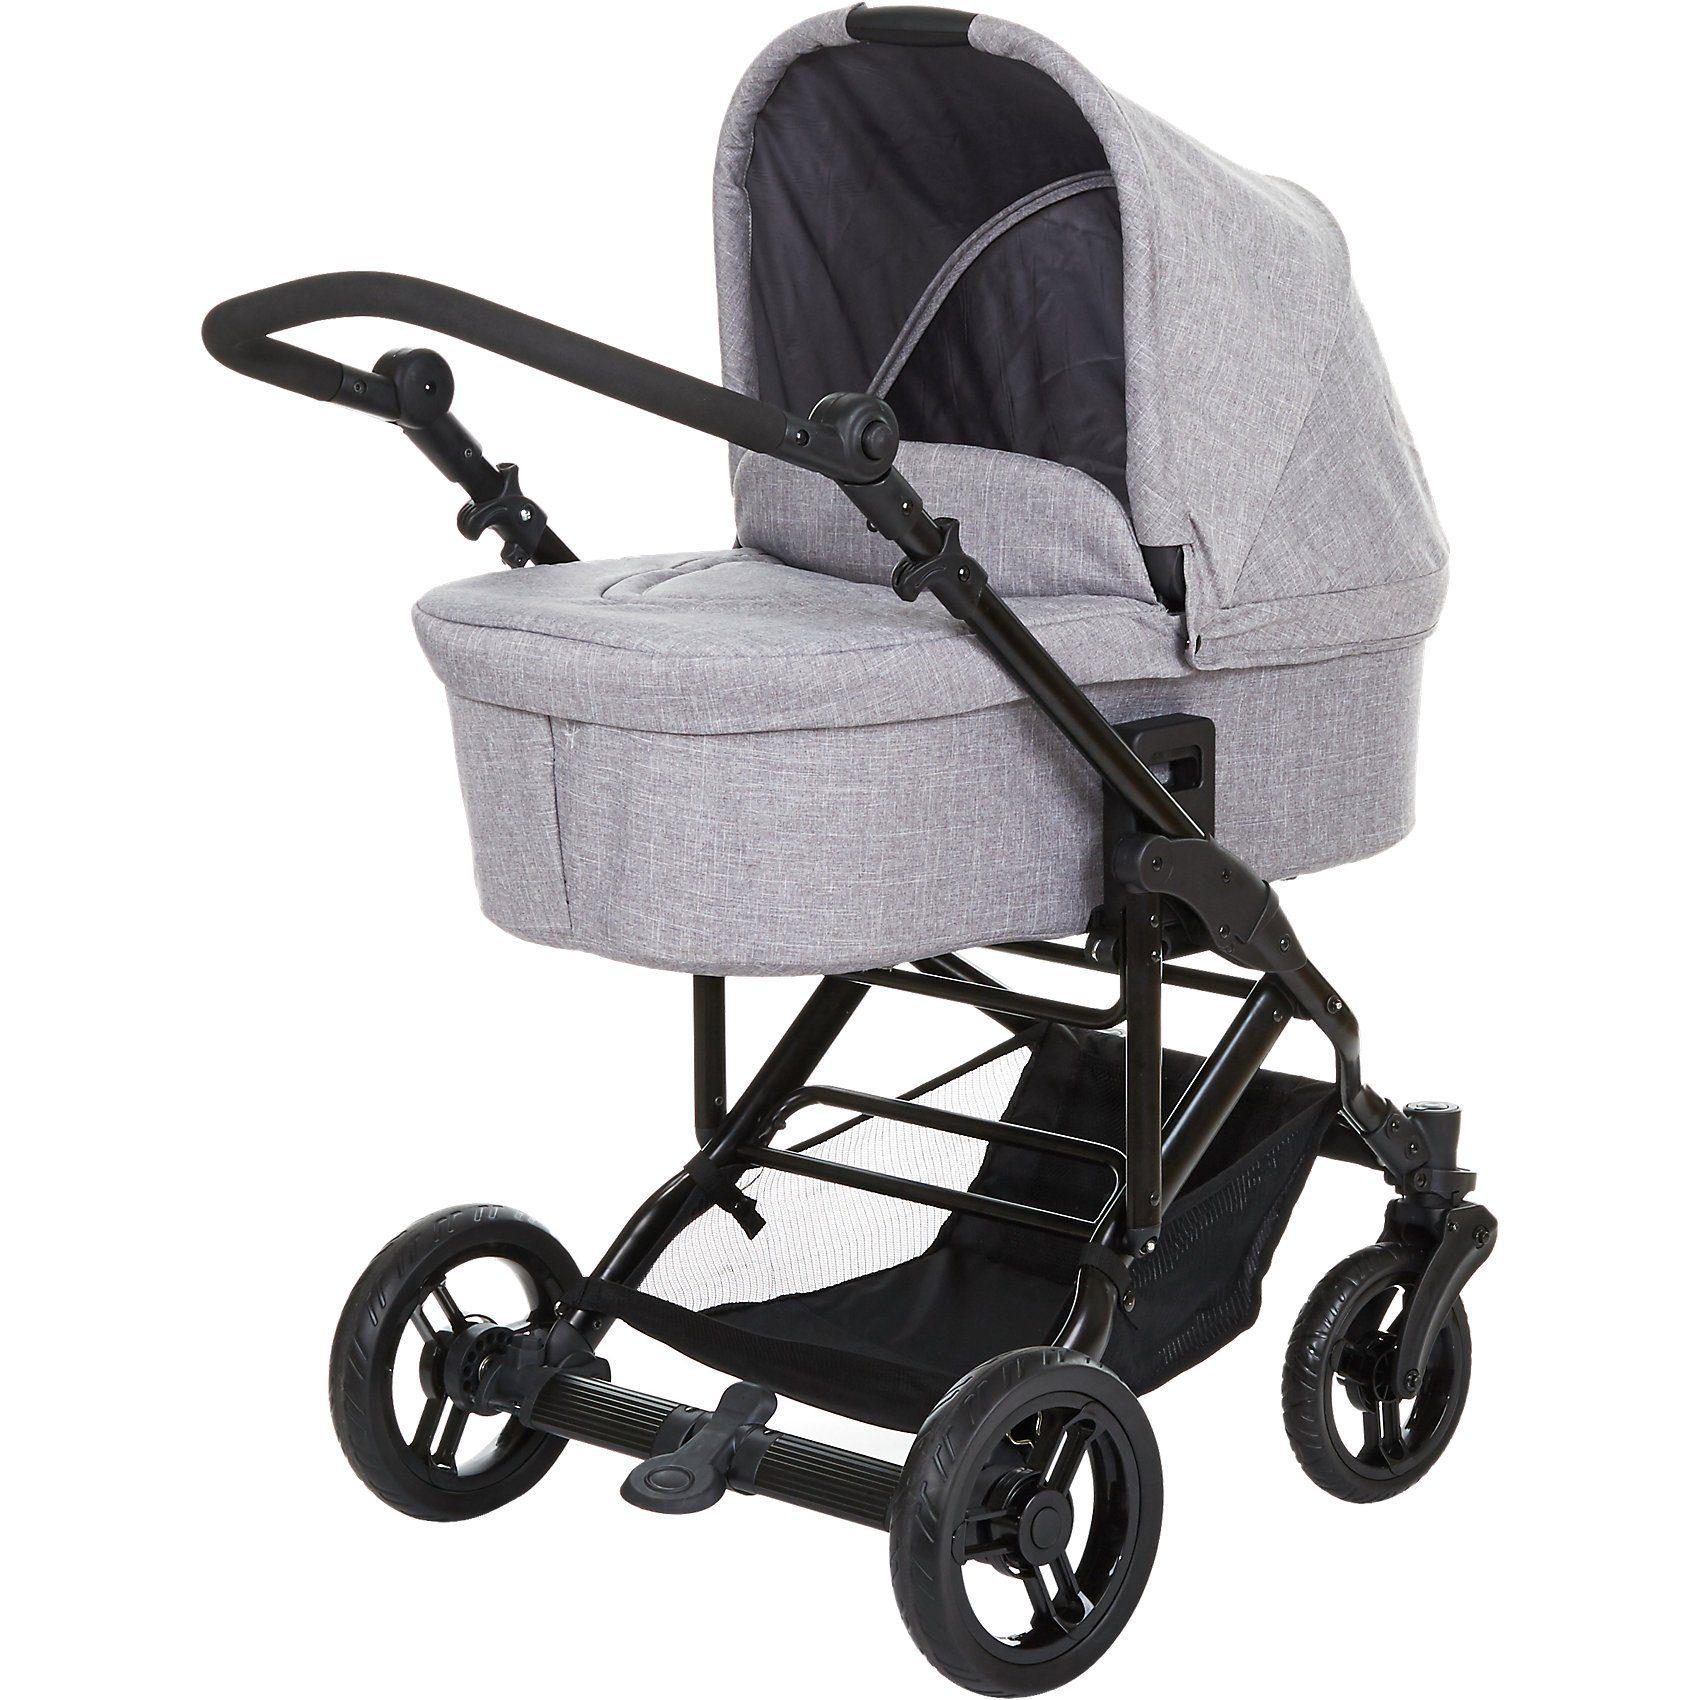 ABC Design Circle Kombi Kinderwagen Como 4 inkl Tragewanne, woven grey